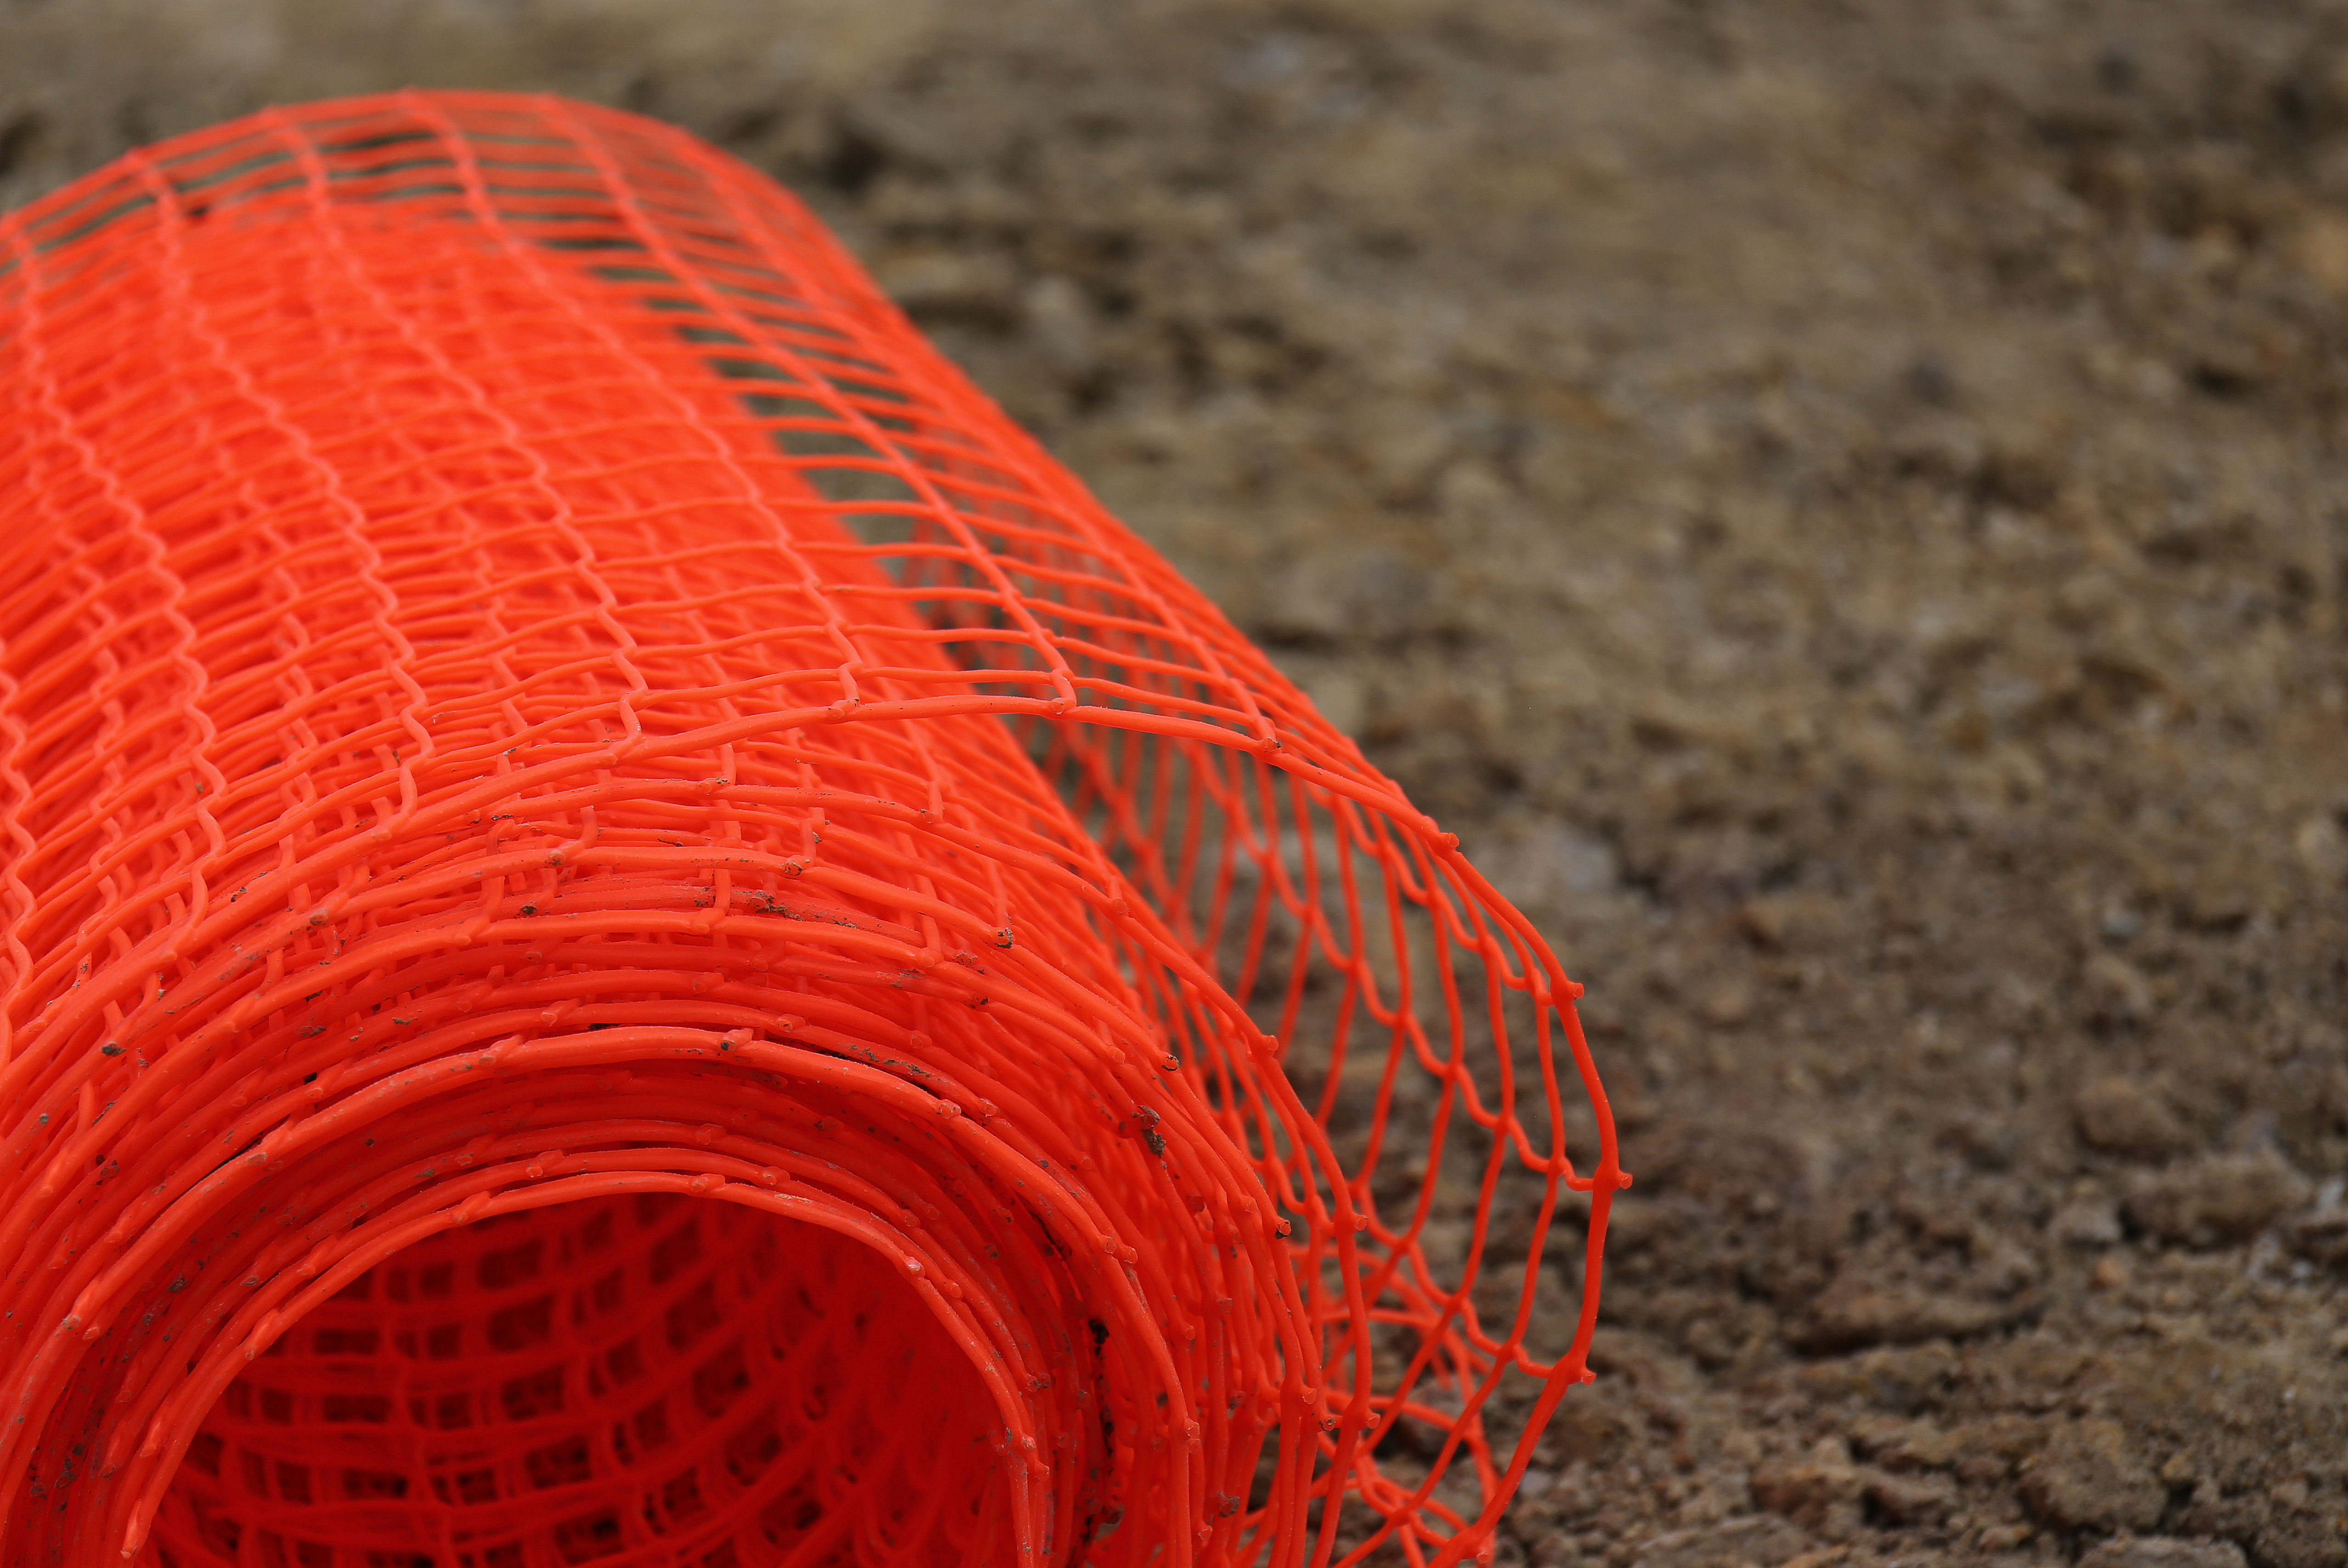 Drainage Civil construction material